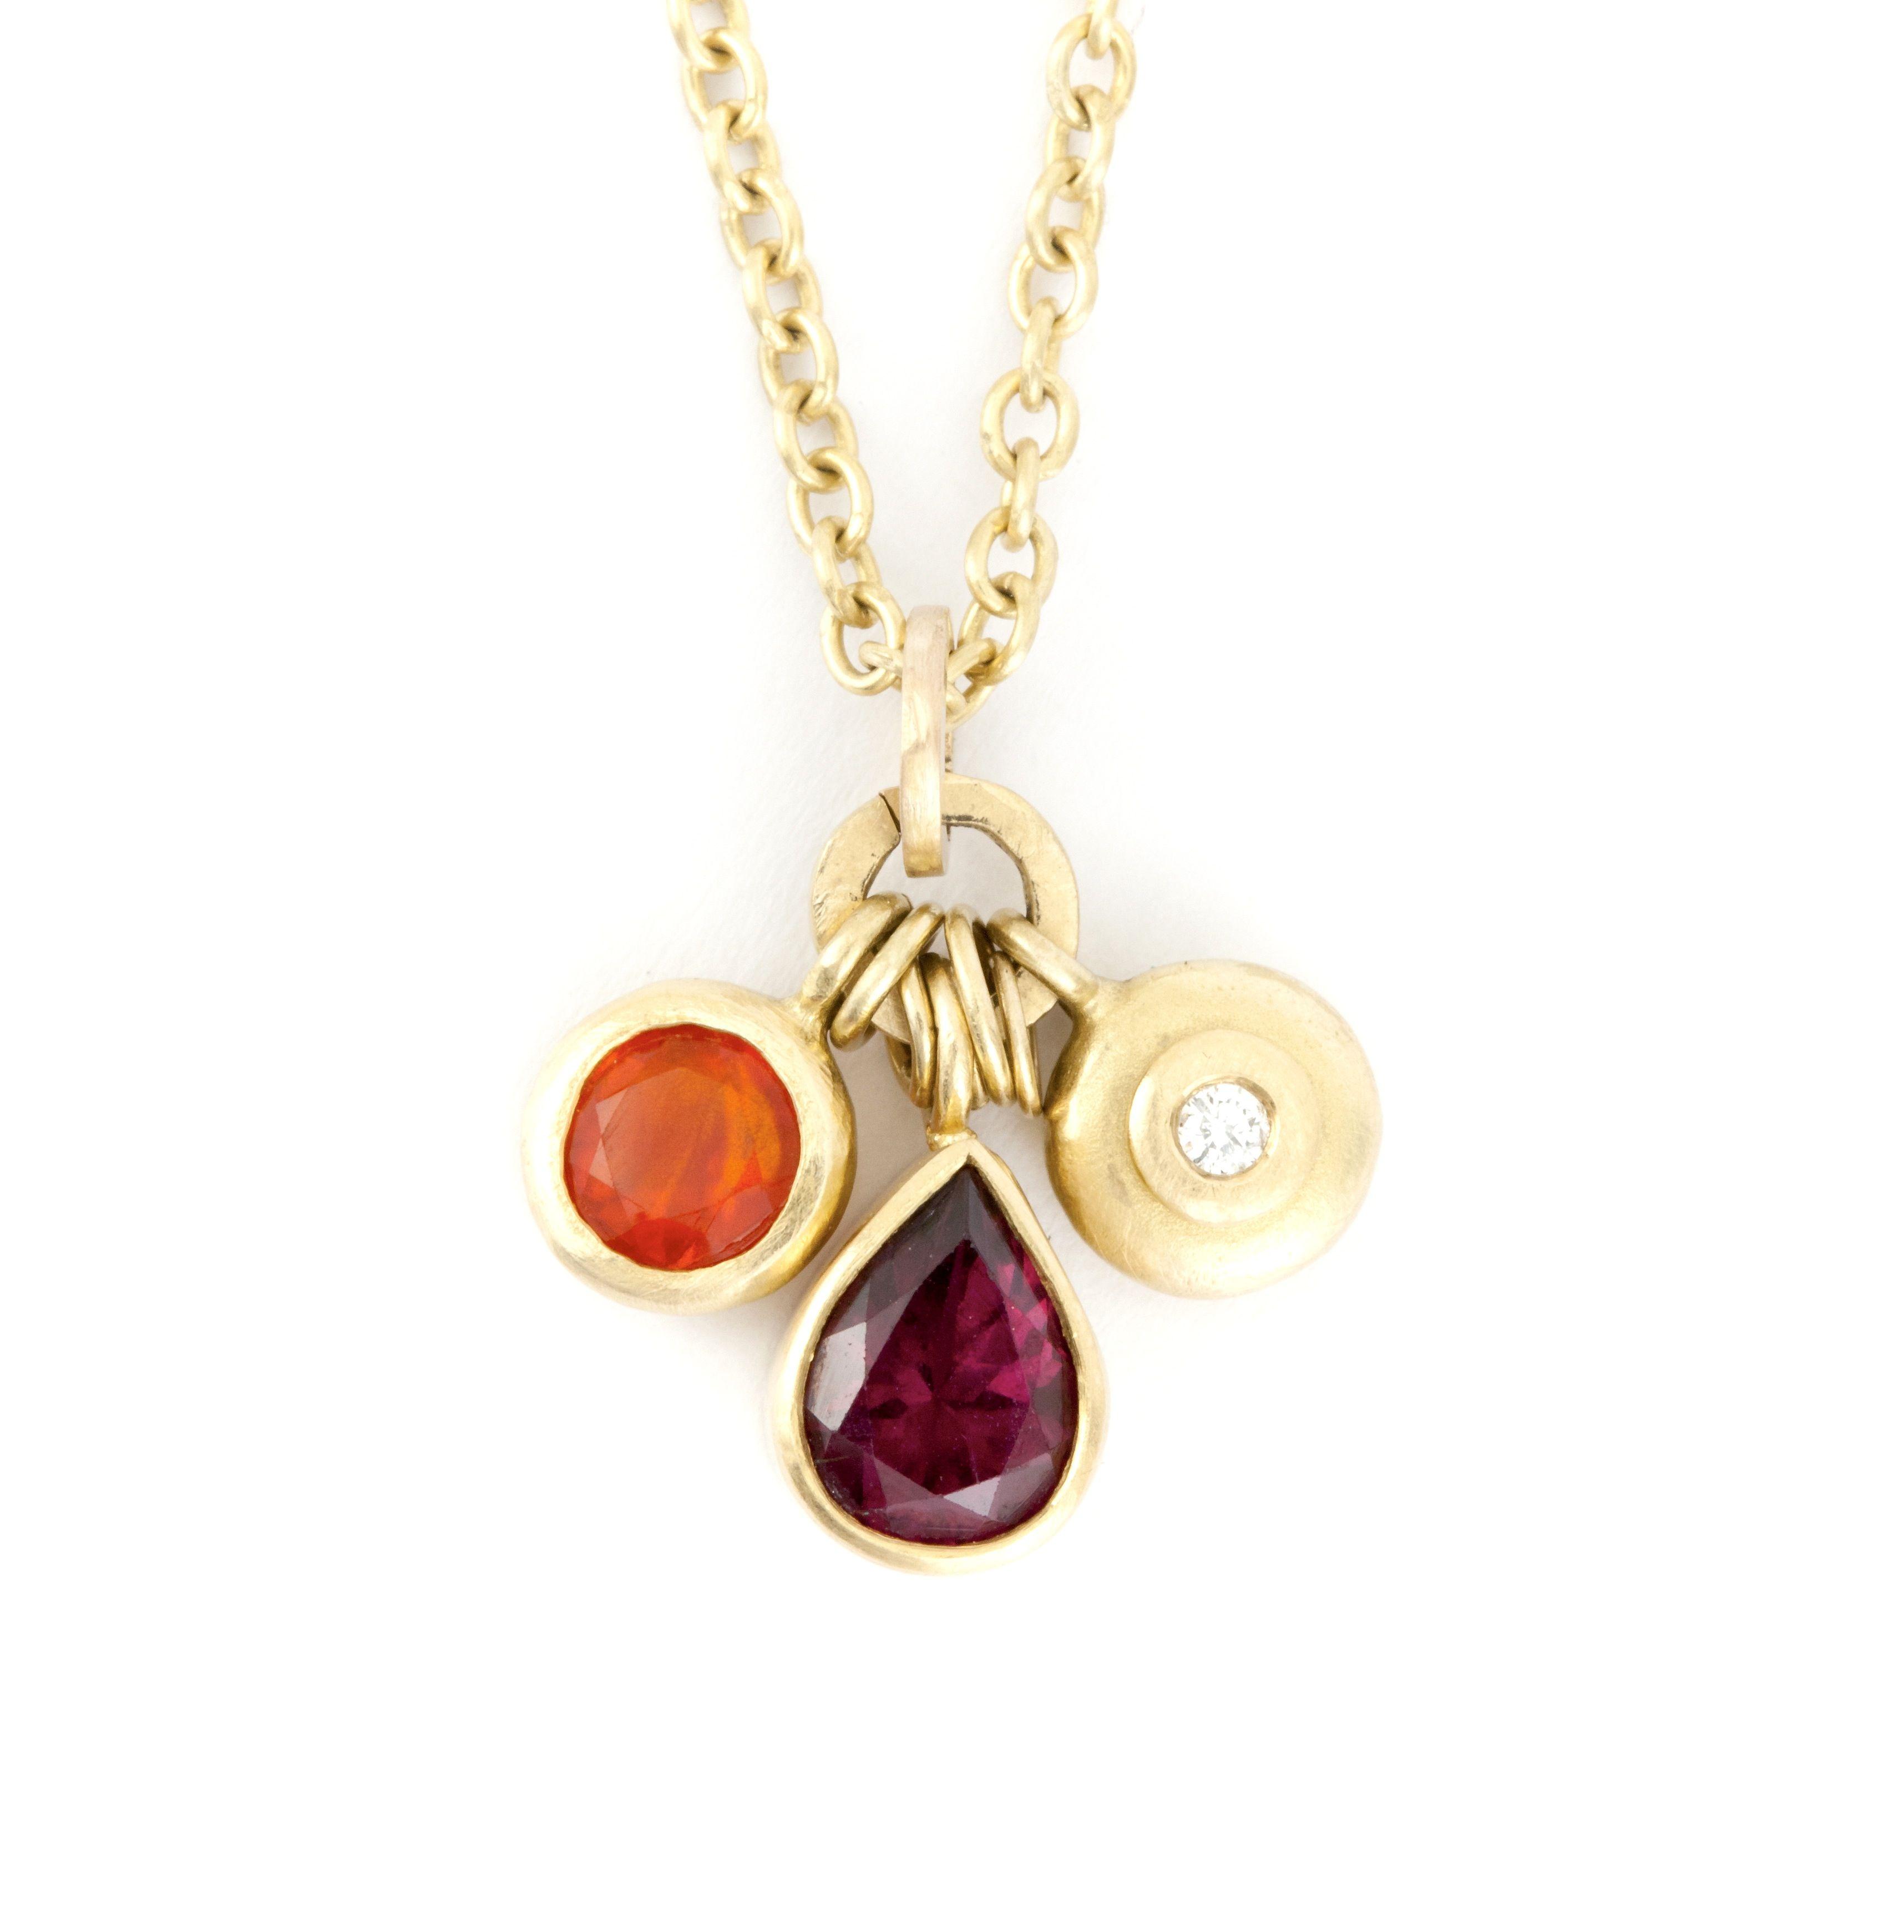 Fleur 18k Gold Pendant With Mexican Fire Opal Raspberry Garnet